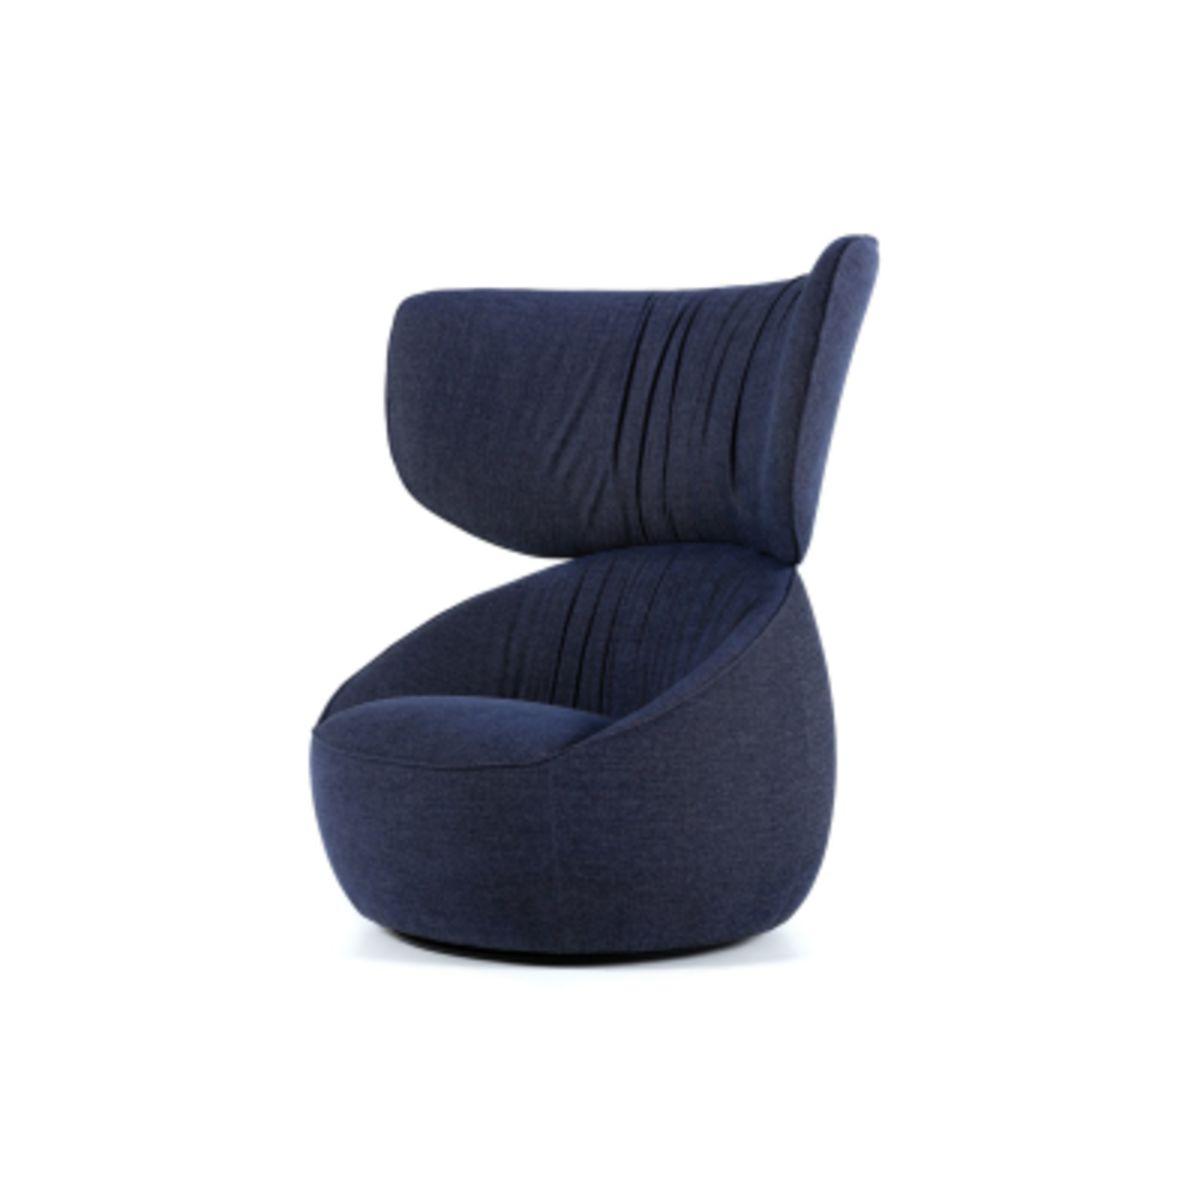 Pleasant Hana Armchair Wingback Price Category 1 Cjindustries Chair Design For Home Cjindustriesco